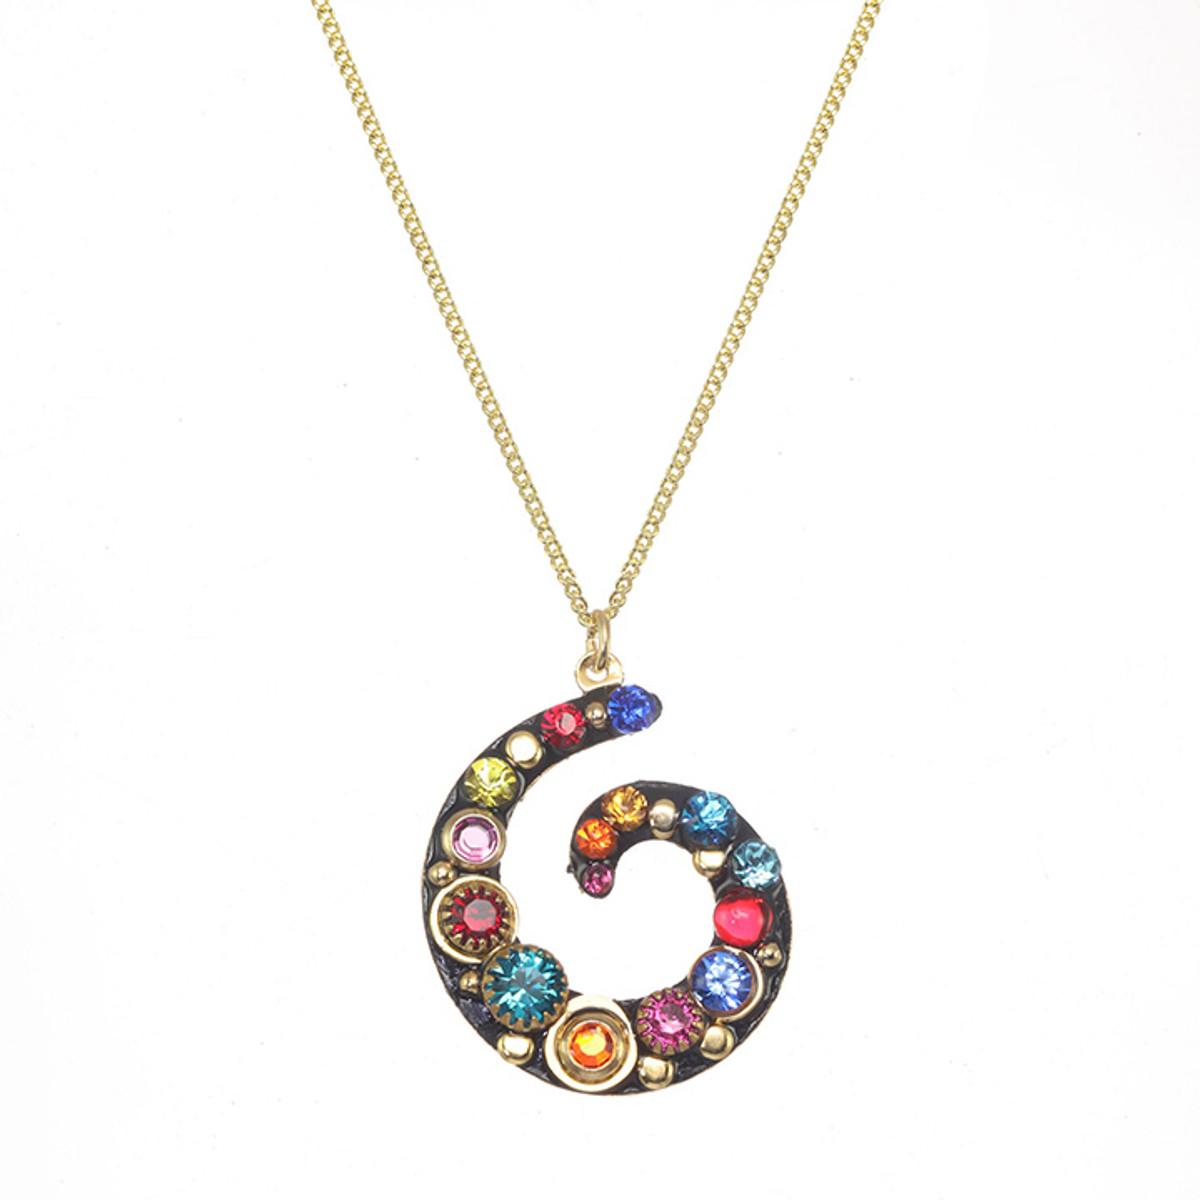 Michal Golan Cosmic Swirl Necklace